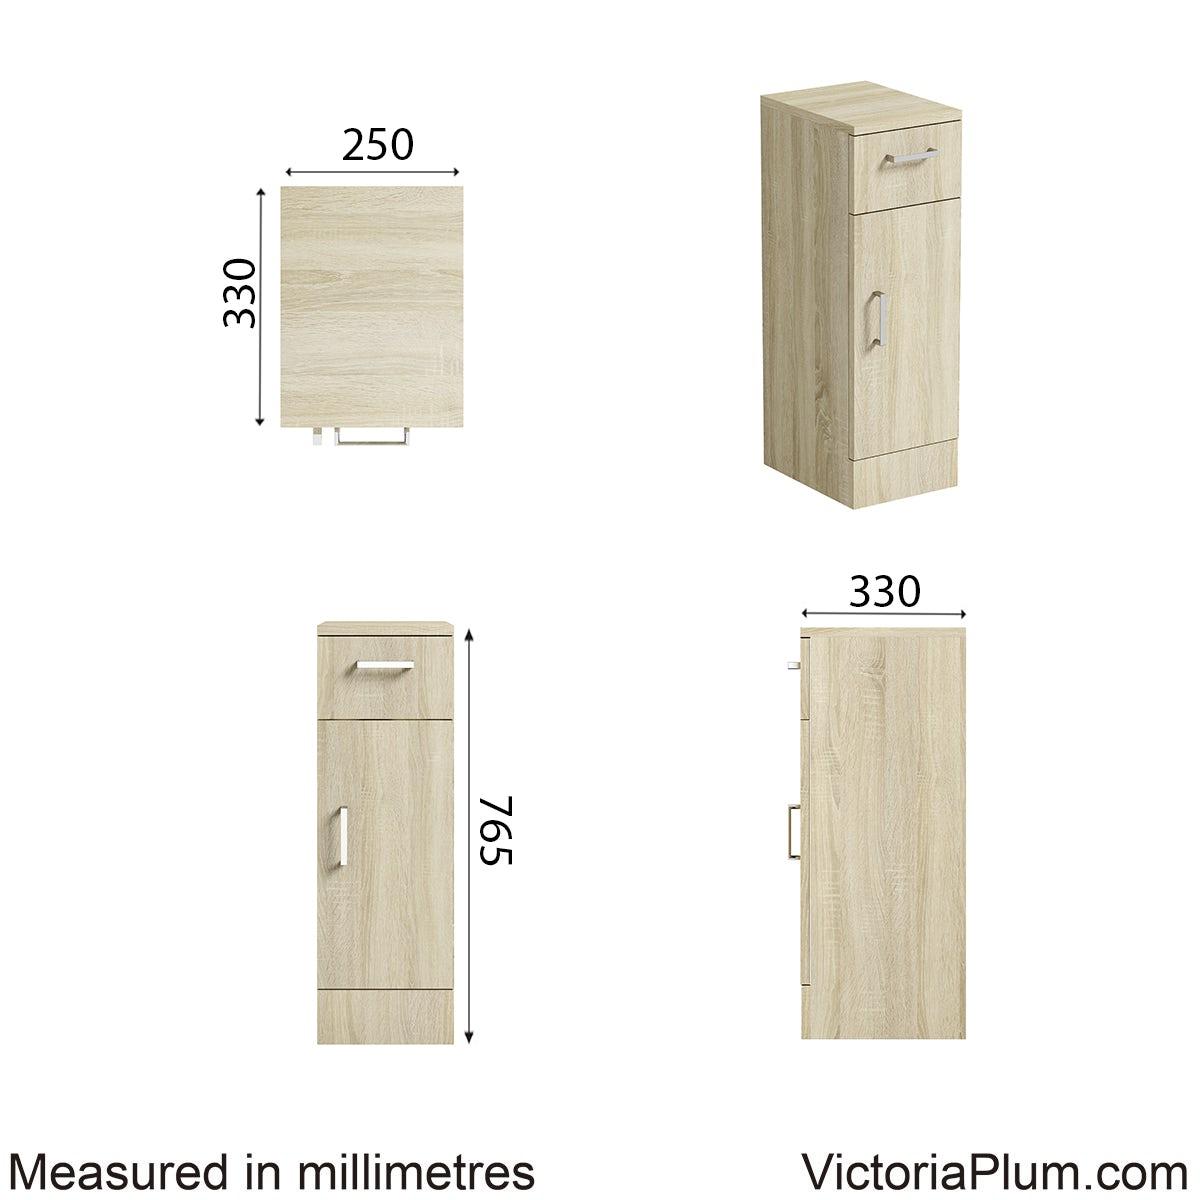 Dimensions for Orchard Eden oak storage unit 330mm